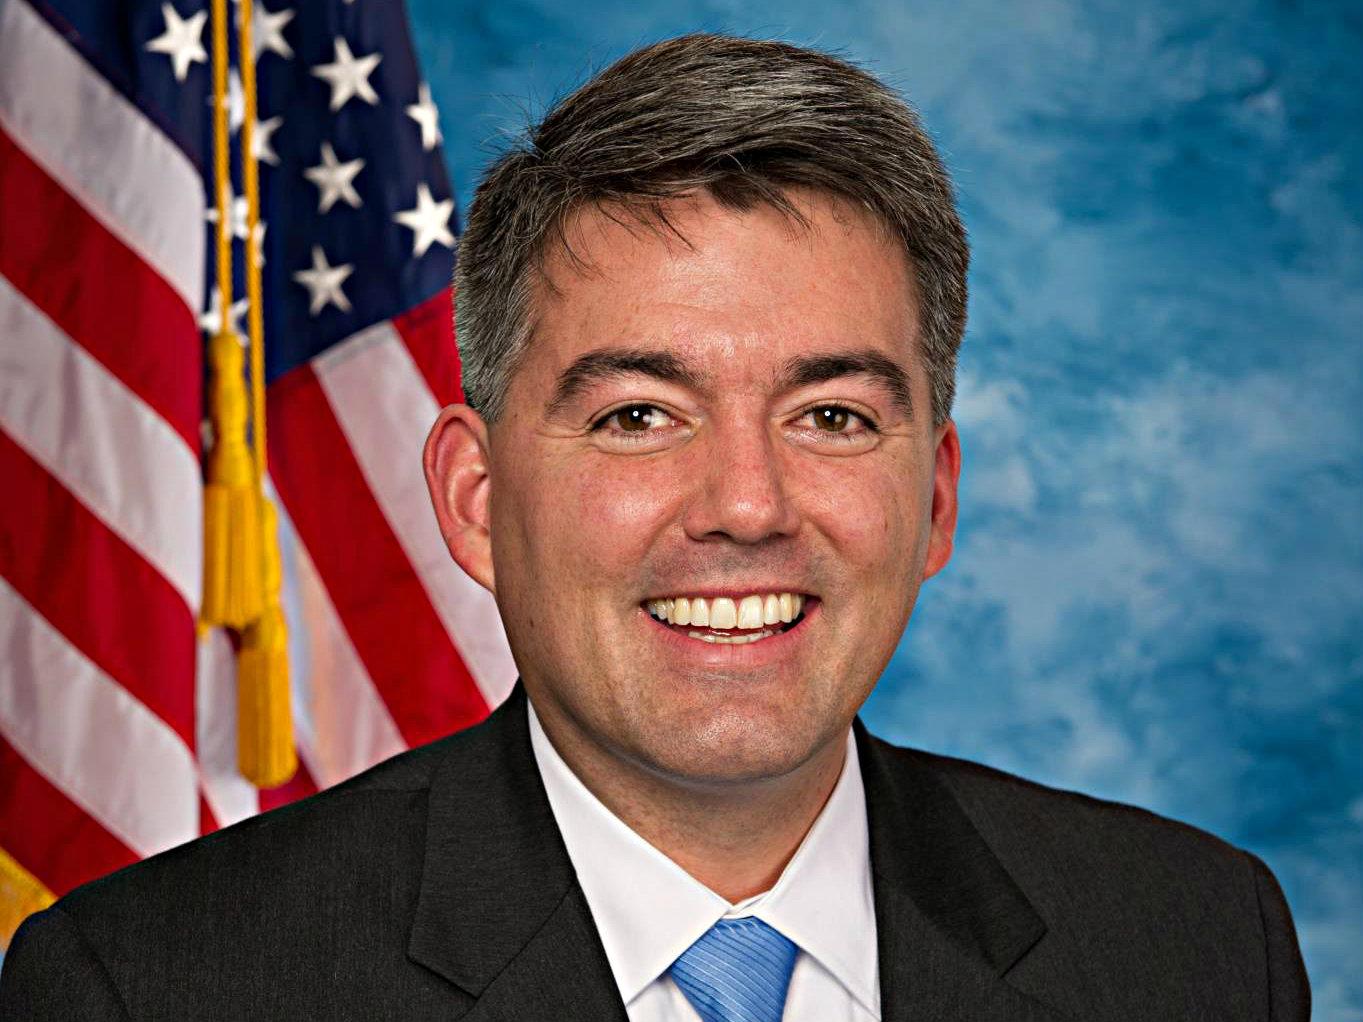 <p>Representative Cory Gardner (R-CO)</p>